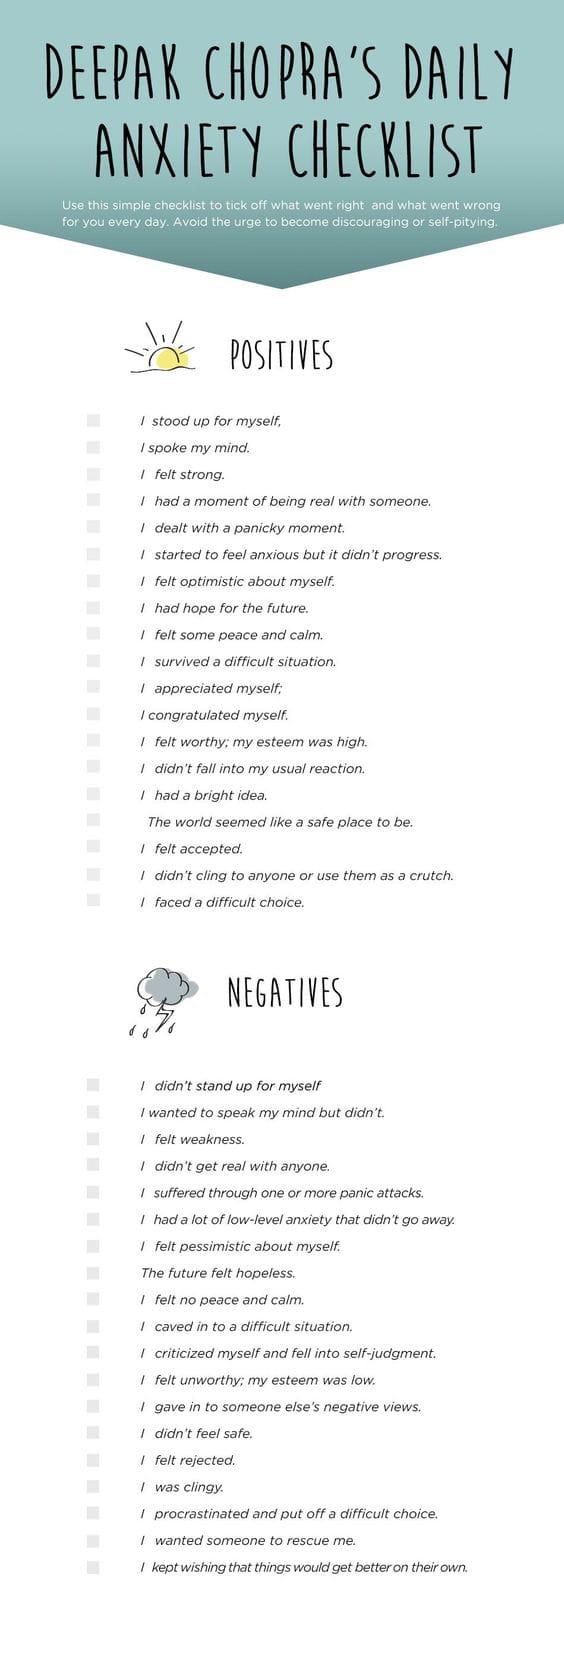 blog sittakarina - cara mengatasi anxiety 2